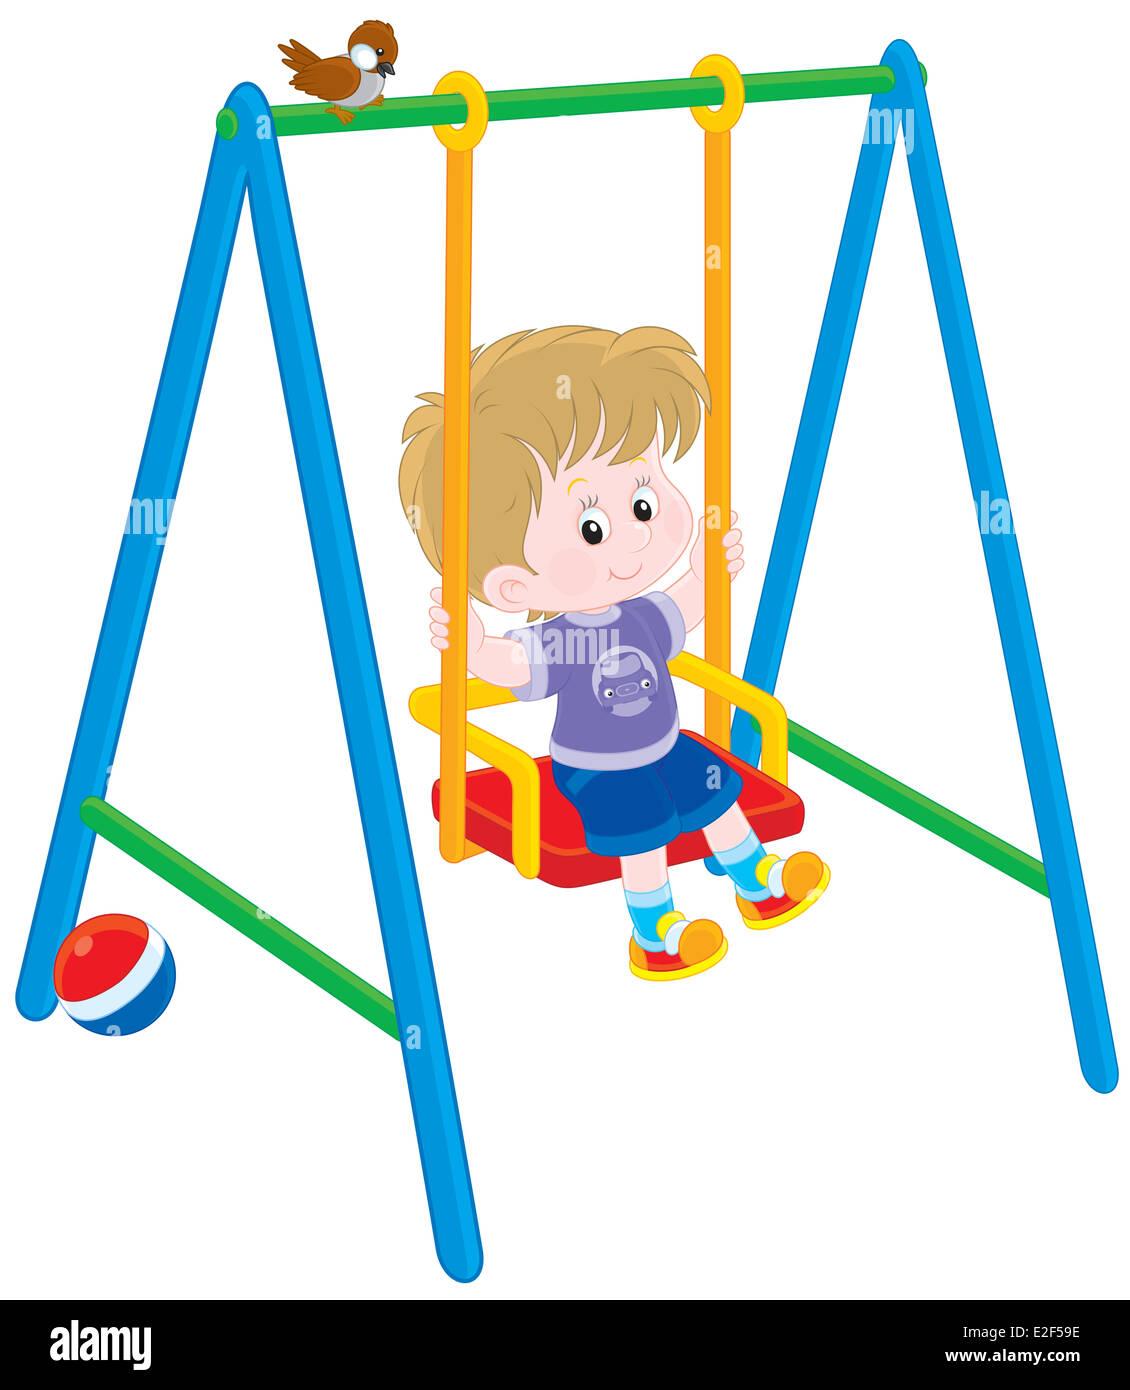 Boy on a swing - Stock Image